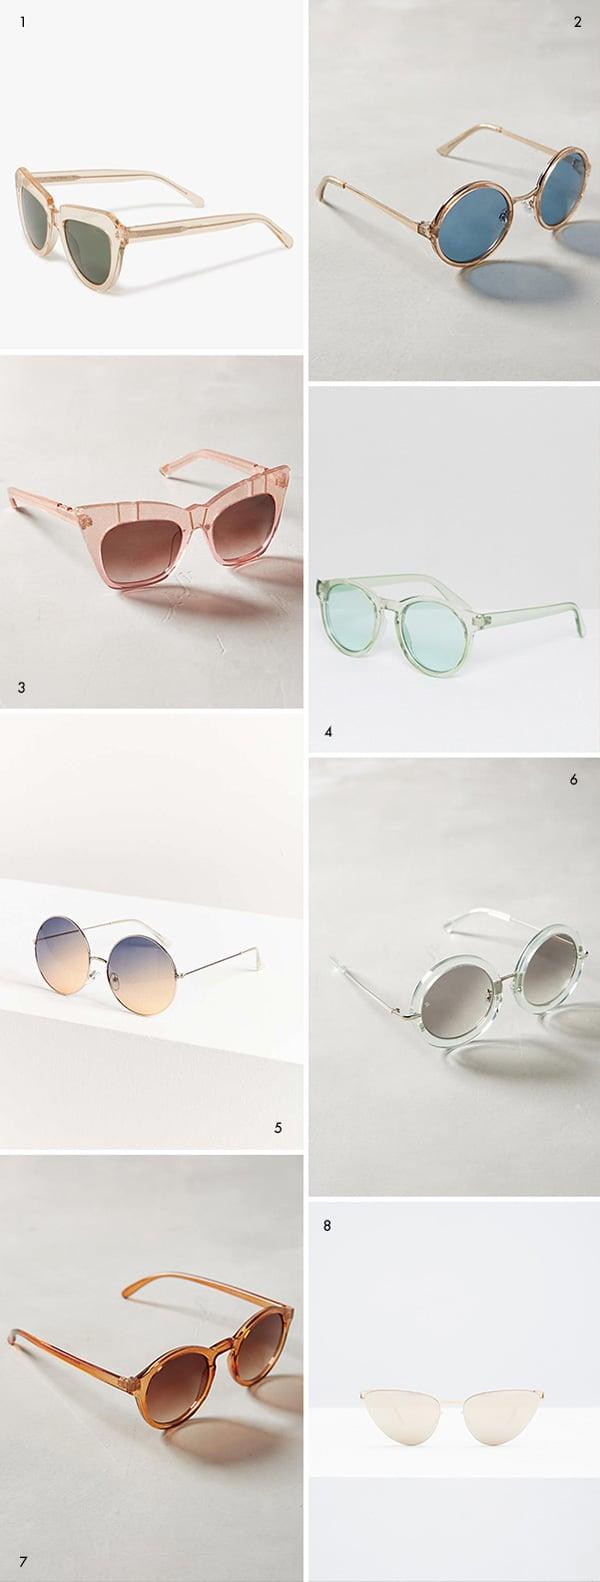 Cool sunglasses in every price range